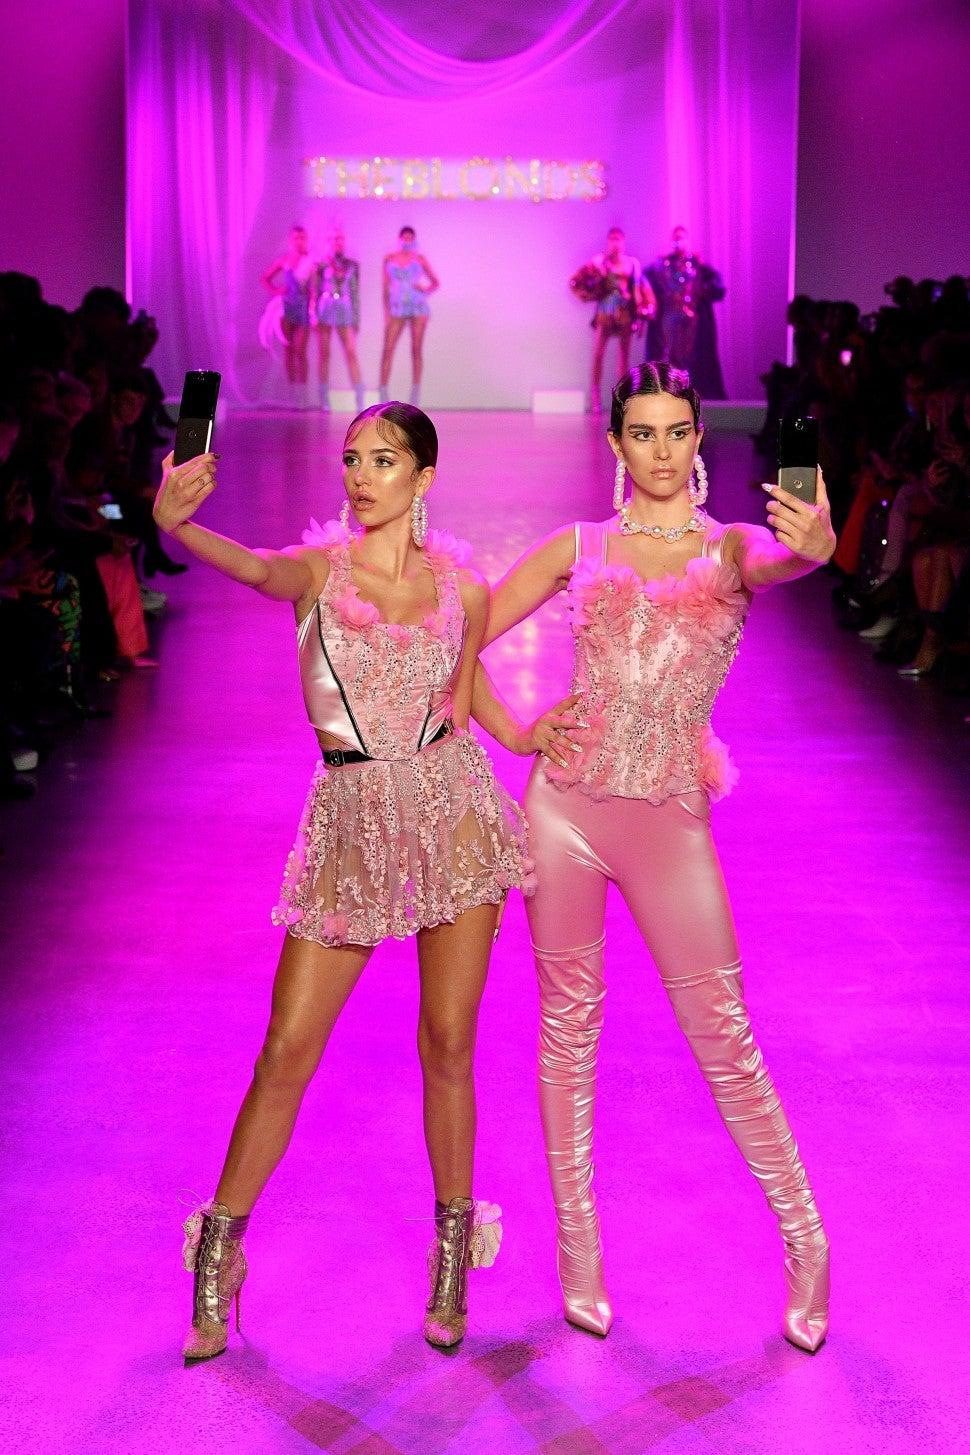 Delilah Belle Hamlin and Amelia Gray Hamlin walk The Blonds F/W 2020 fashion show